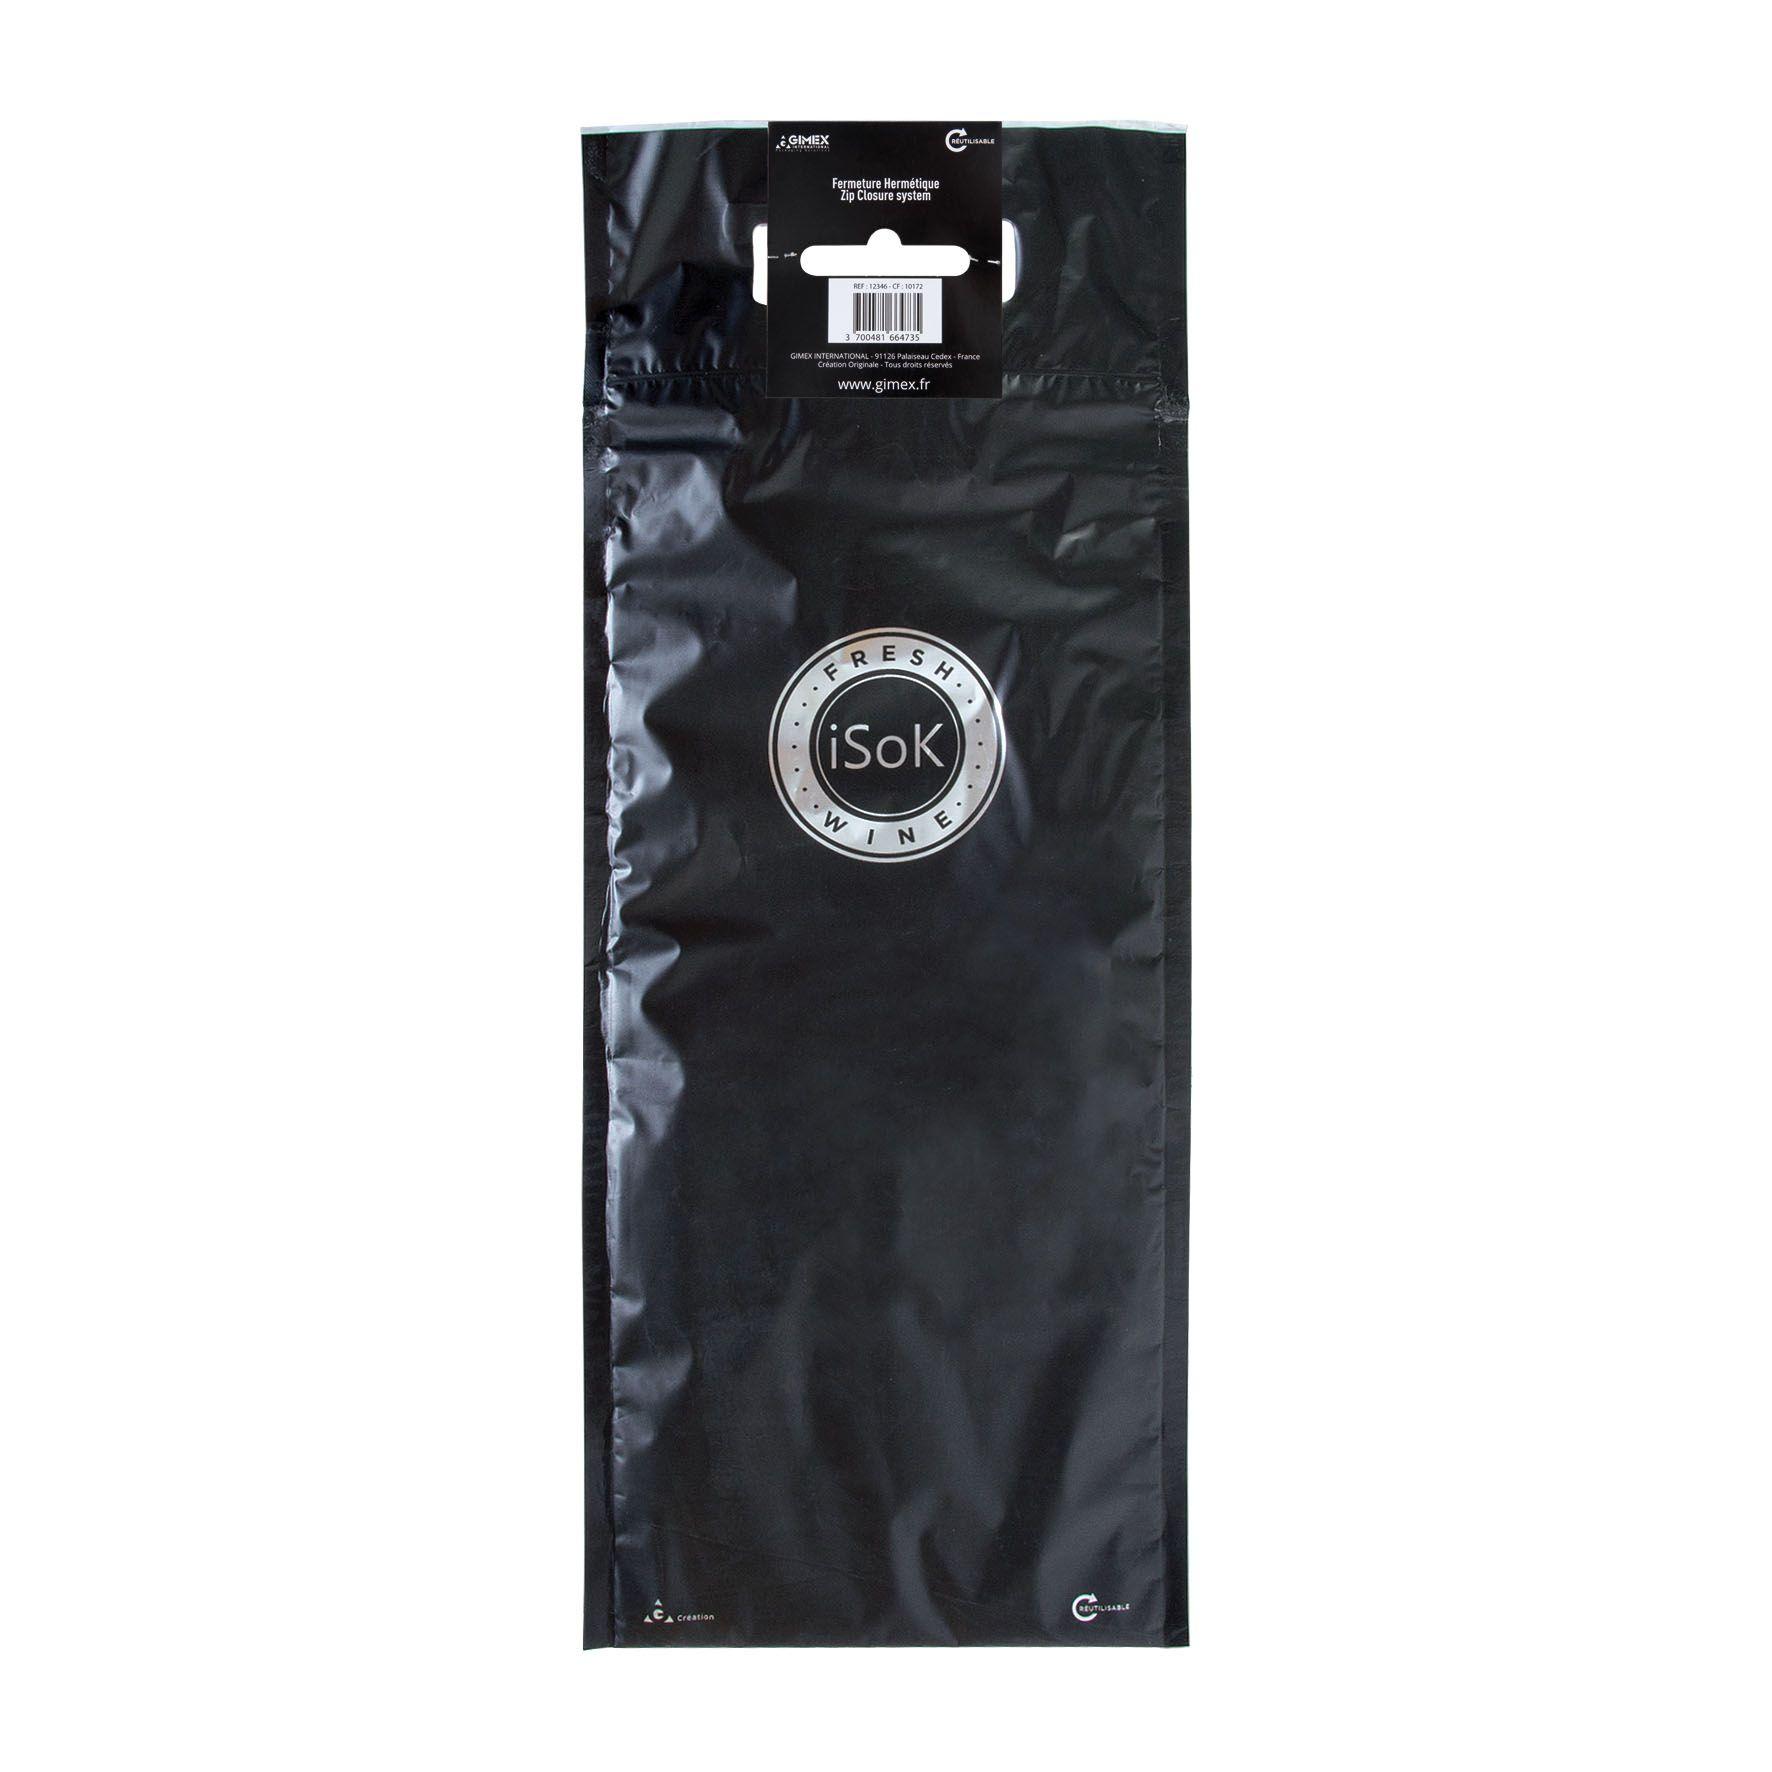 Cadeau promotionnel - Sac isotherme 1 Bouteille Isok®